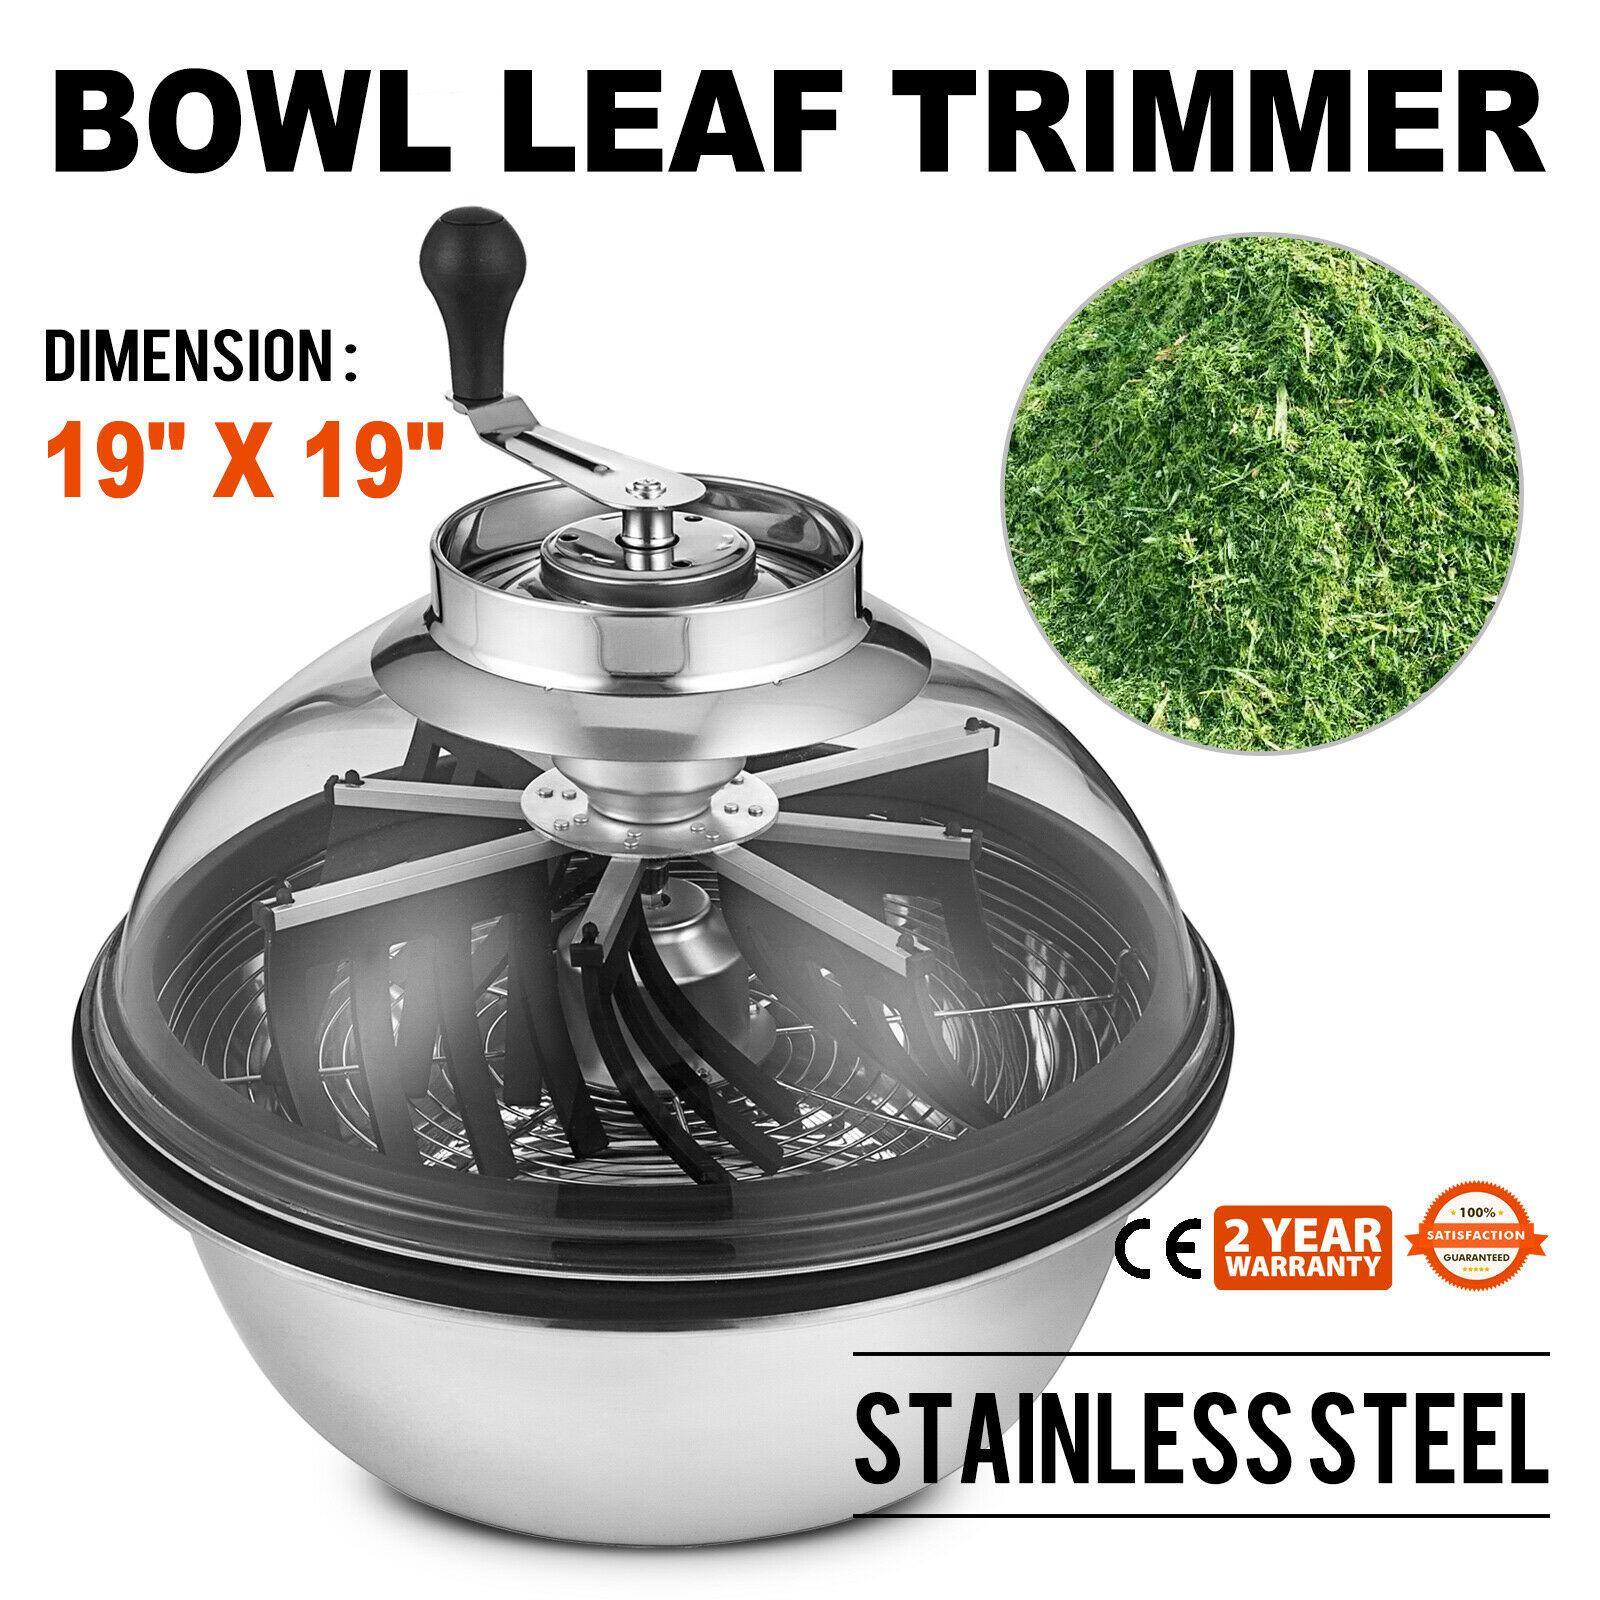 Bowl Trimmer Bowl Hydroponic Trimmer Manual Trimmer Leaf Gem Trim Harvester Cutter Twisted Spin Cut For Plant Bud And Flower